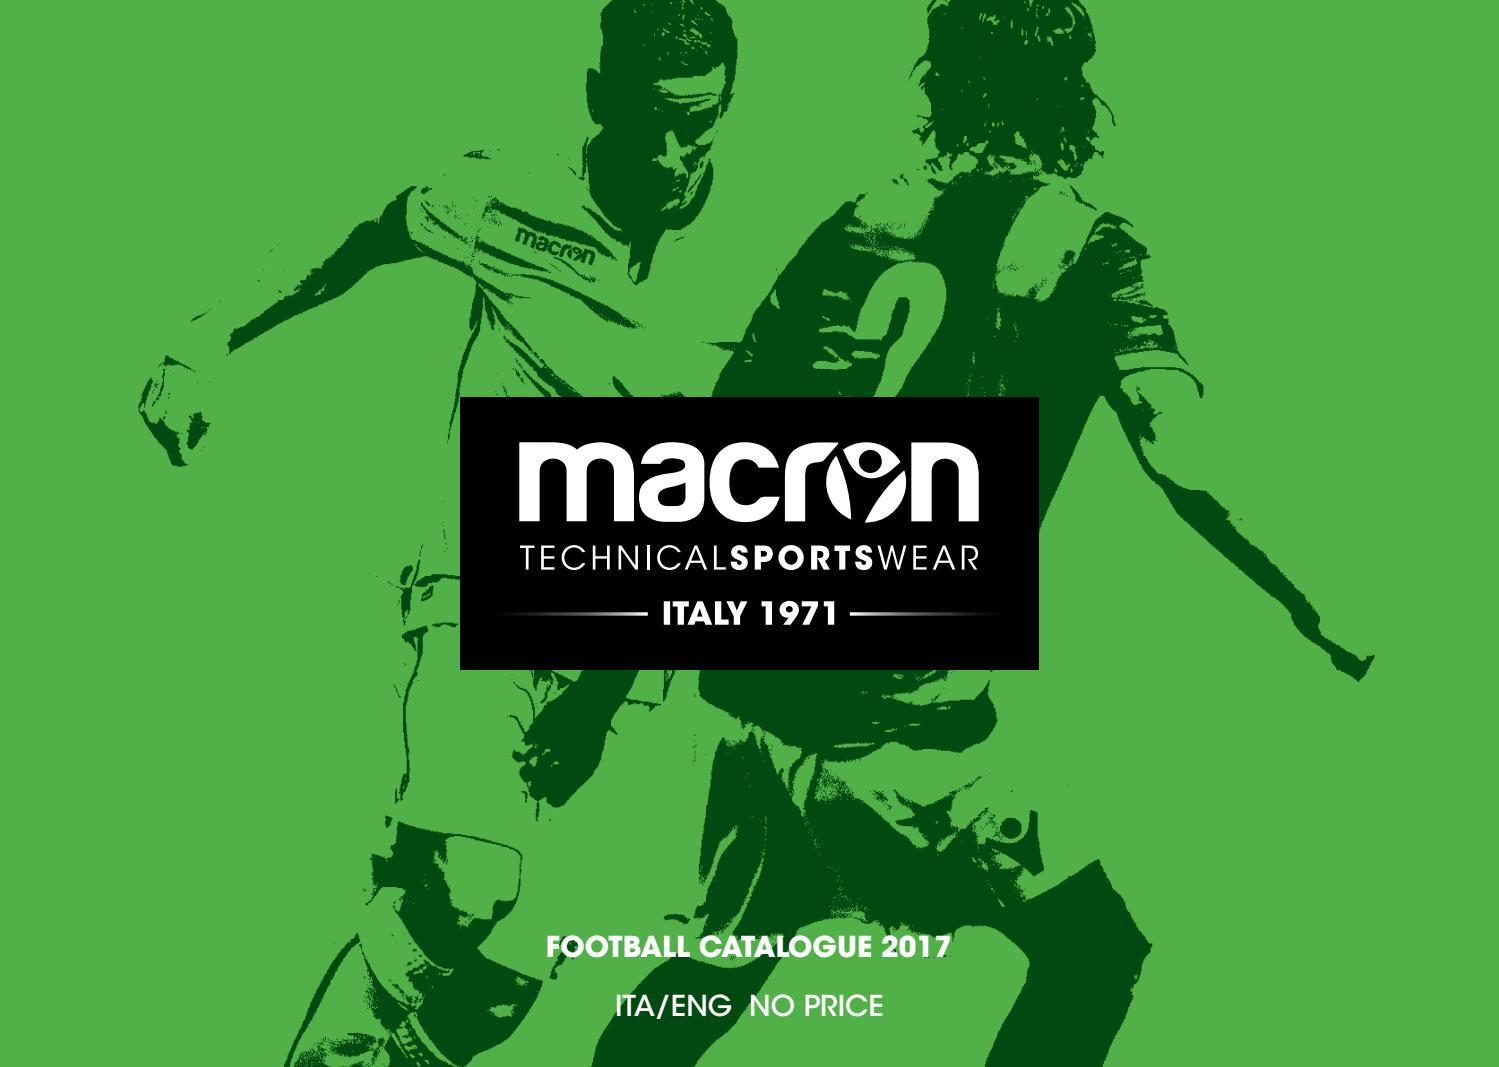 Macron Cassiopea Goalkeeper Childrens Short Portiere Nero Colour Black Size S